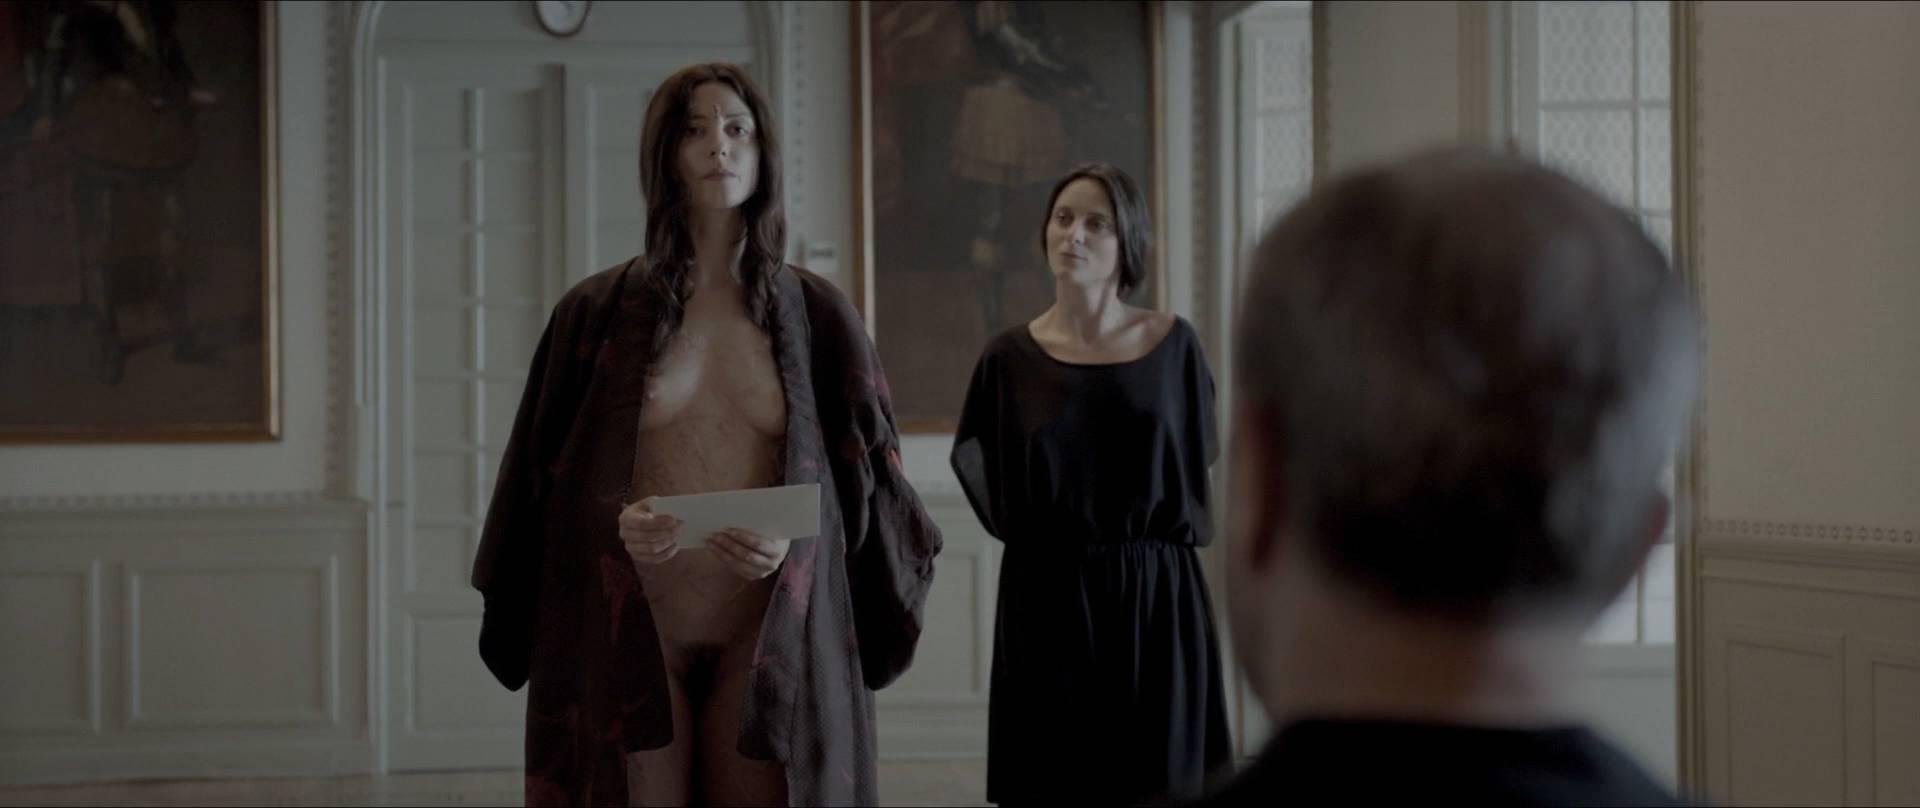 Bárbara Lennie nude full frontal - Magical Girl (ES-2014) hd080p (2)